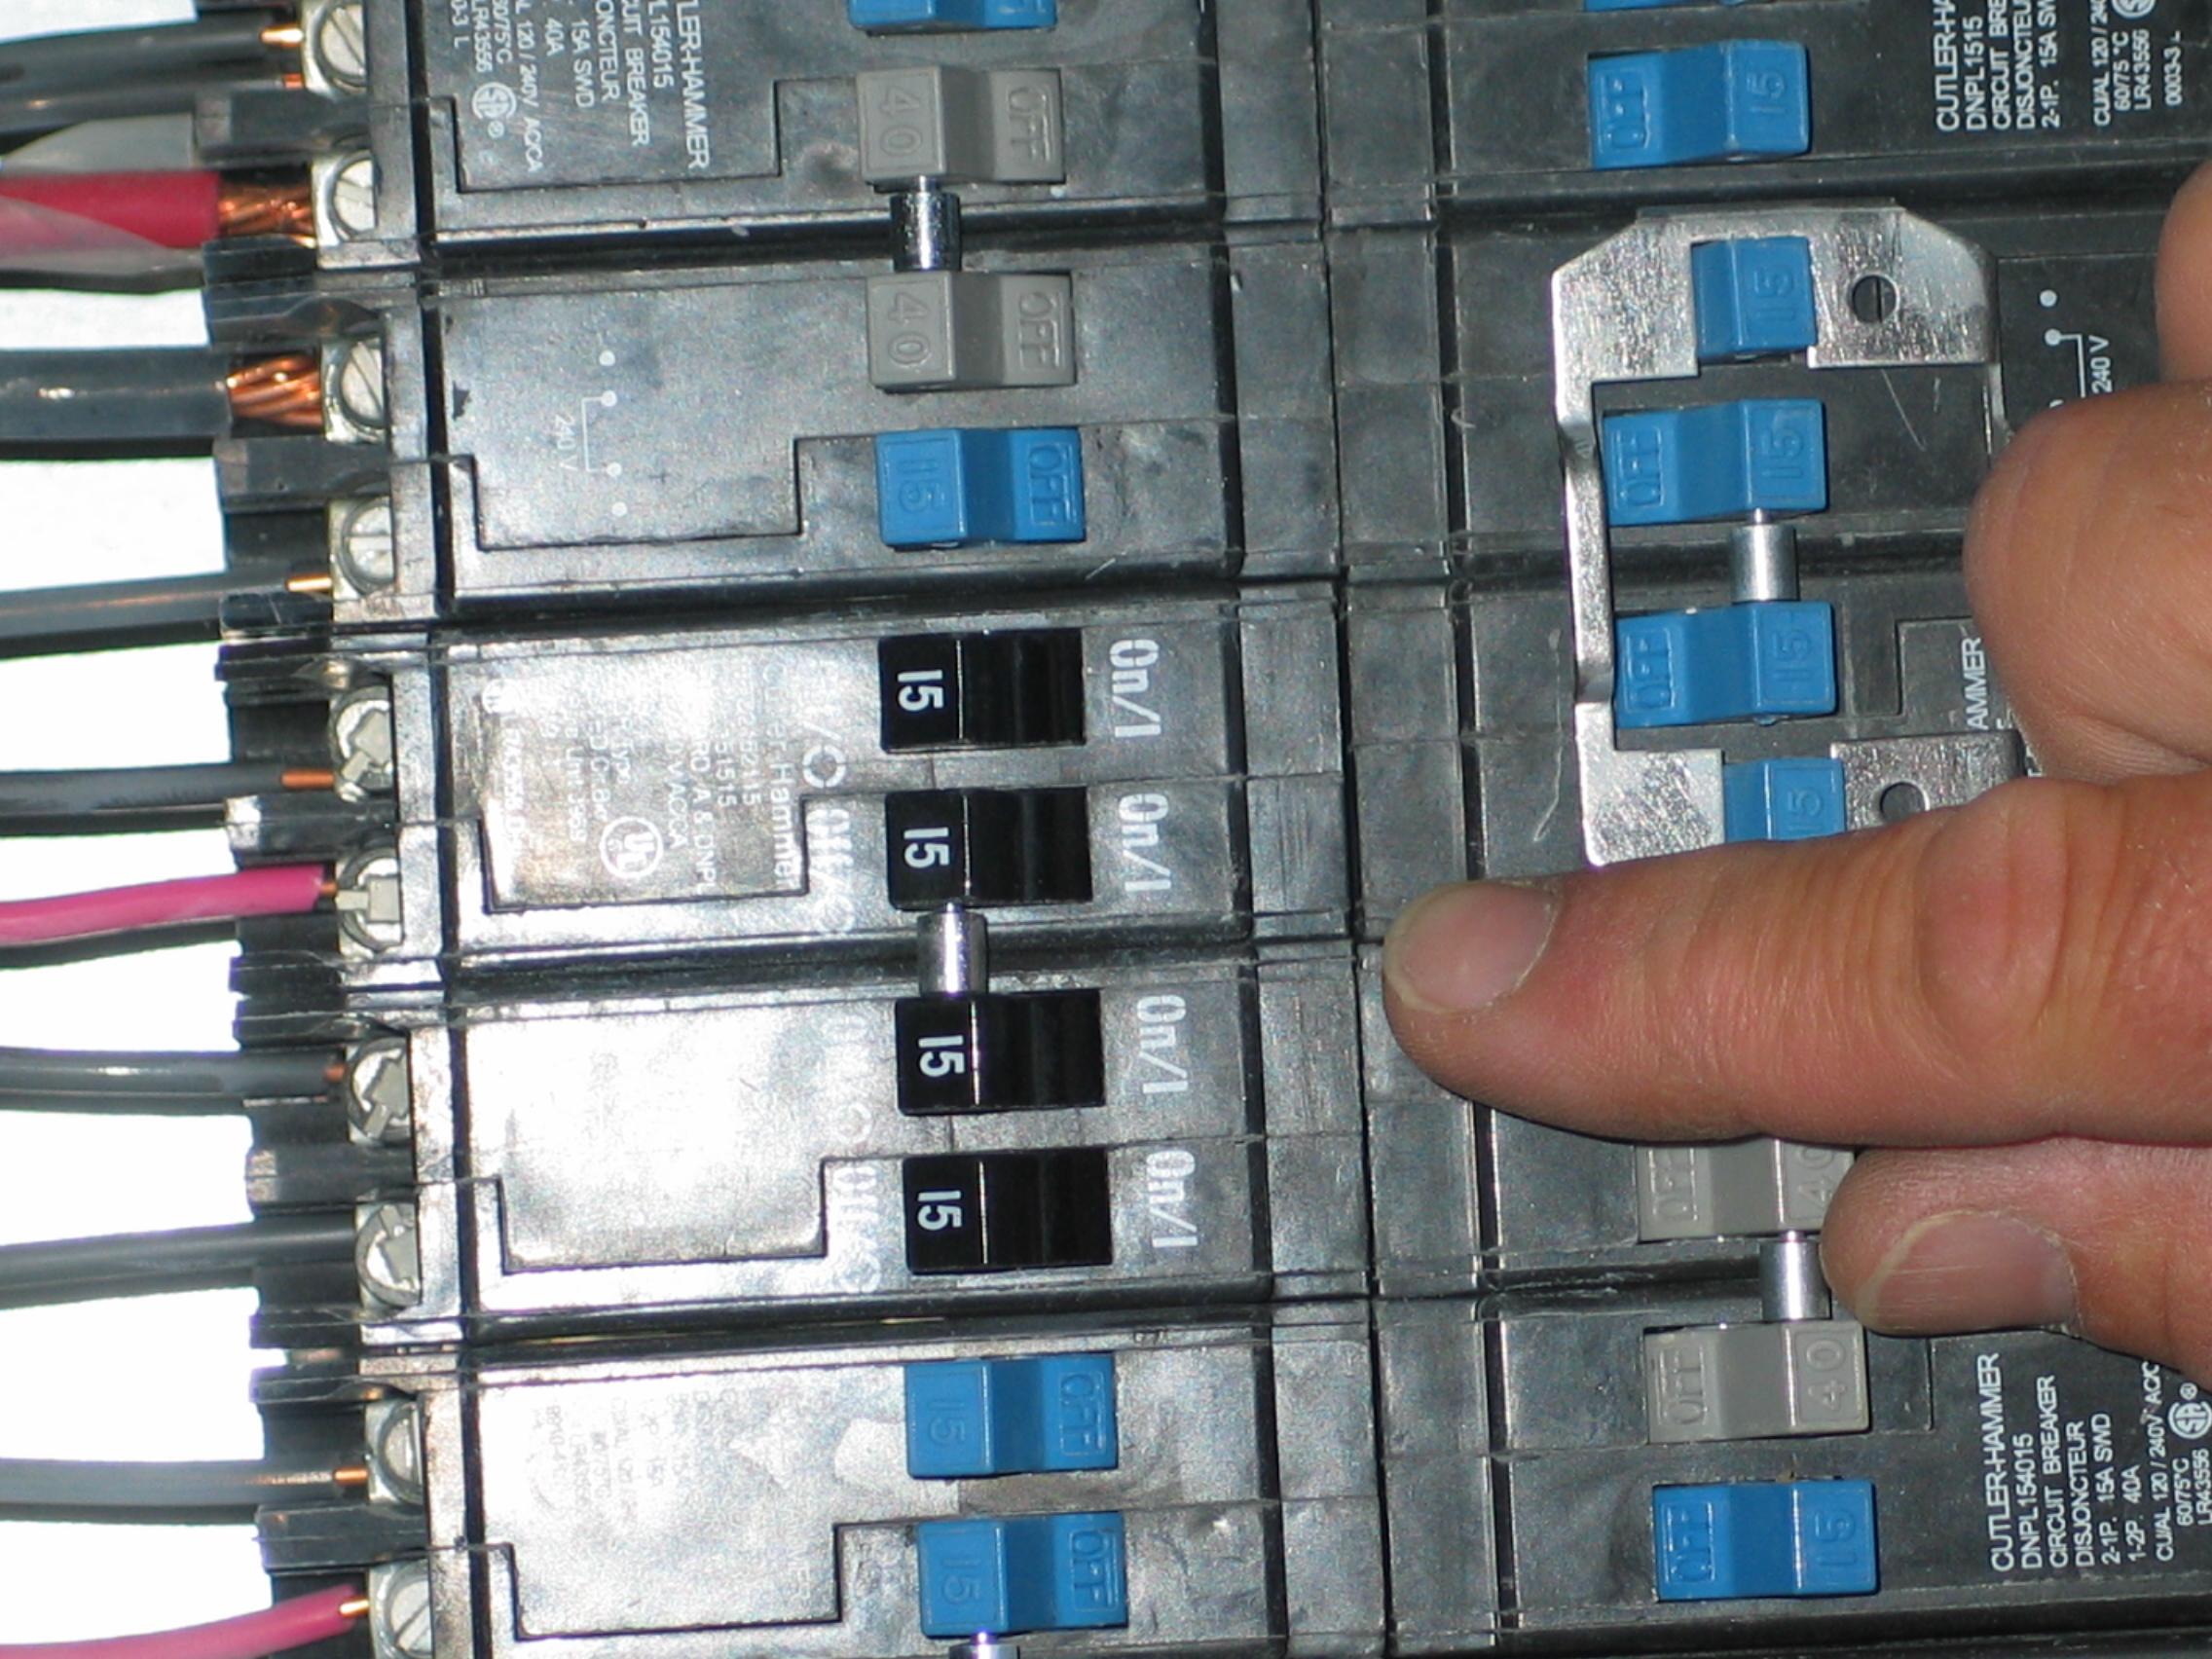 220-240 Wiring Diagram Instructions - Dannychesnut - Double Pole Circuit Breaker Wiring Diagram